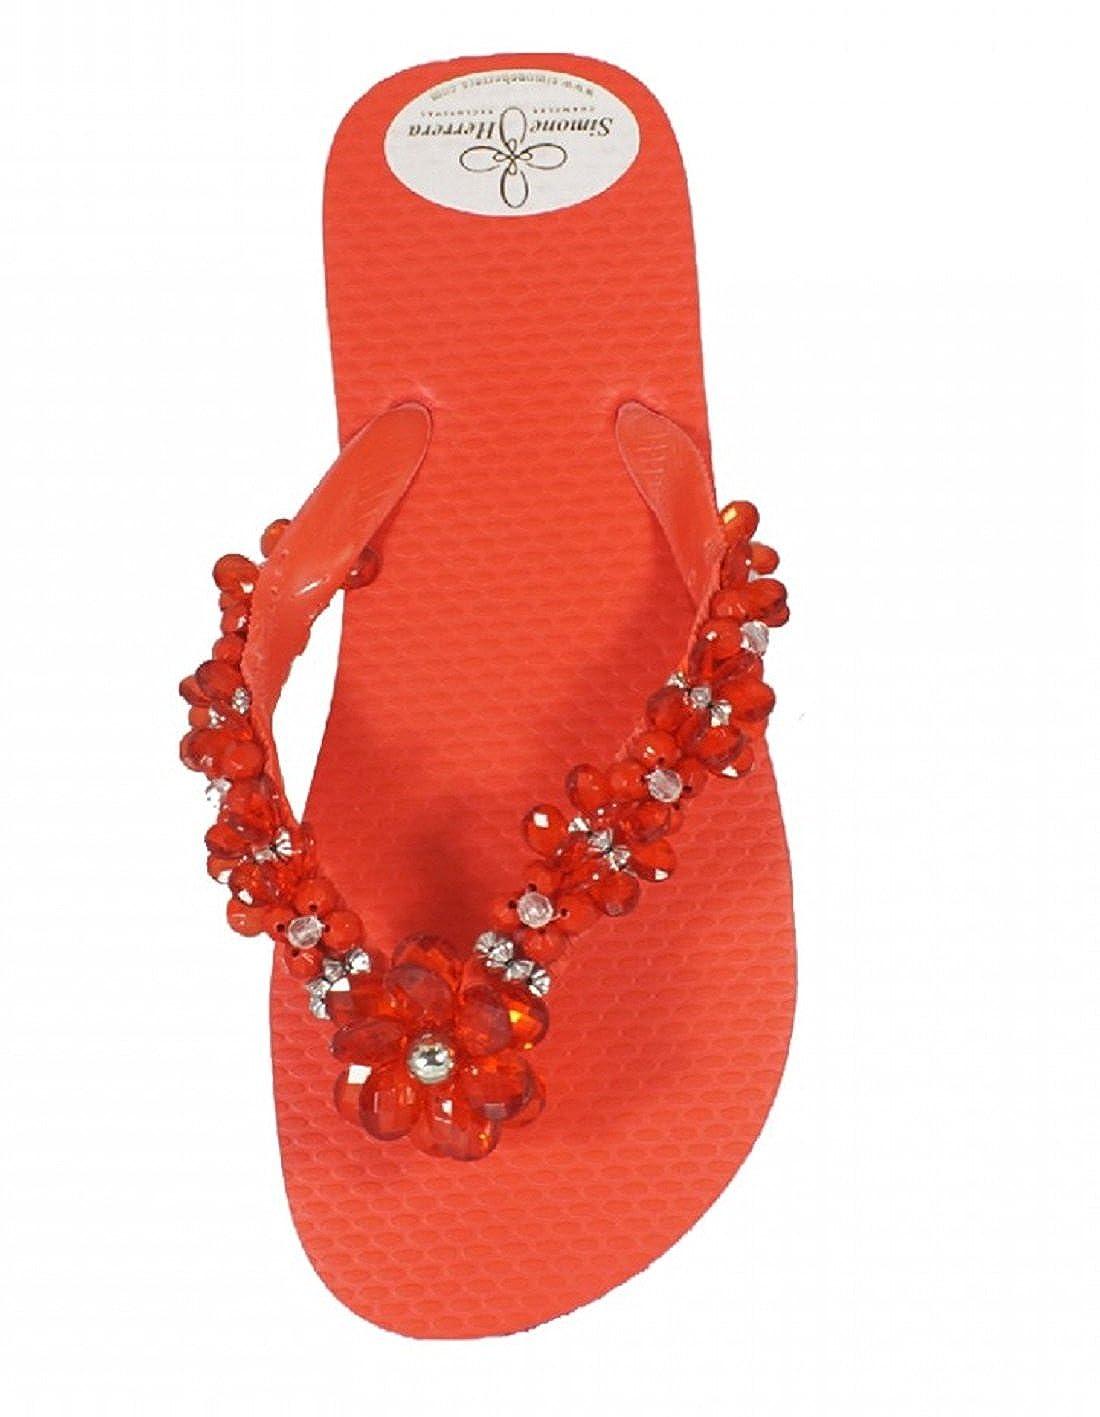 Designer Luxus Flip Flip Flip Flops-Chanclas Exclusivas by Simone Herrera-Flora Line-Lena-Riemchen Sandale Zehentrenner 9e3e74